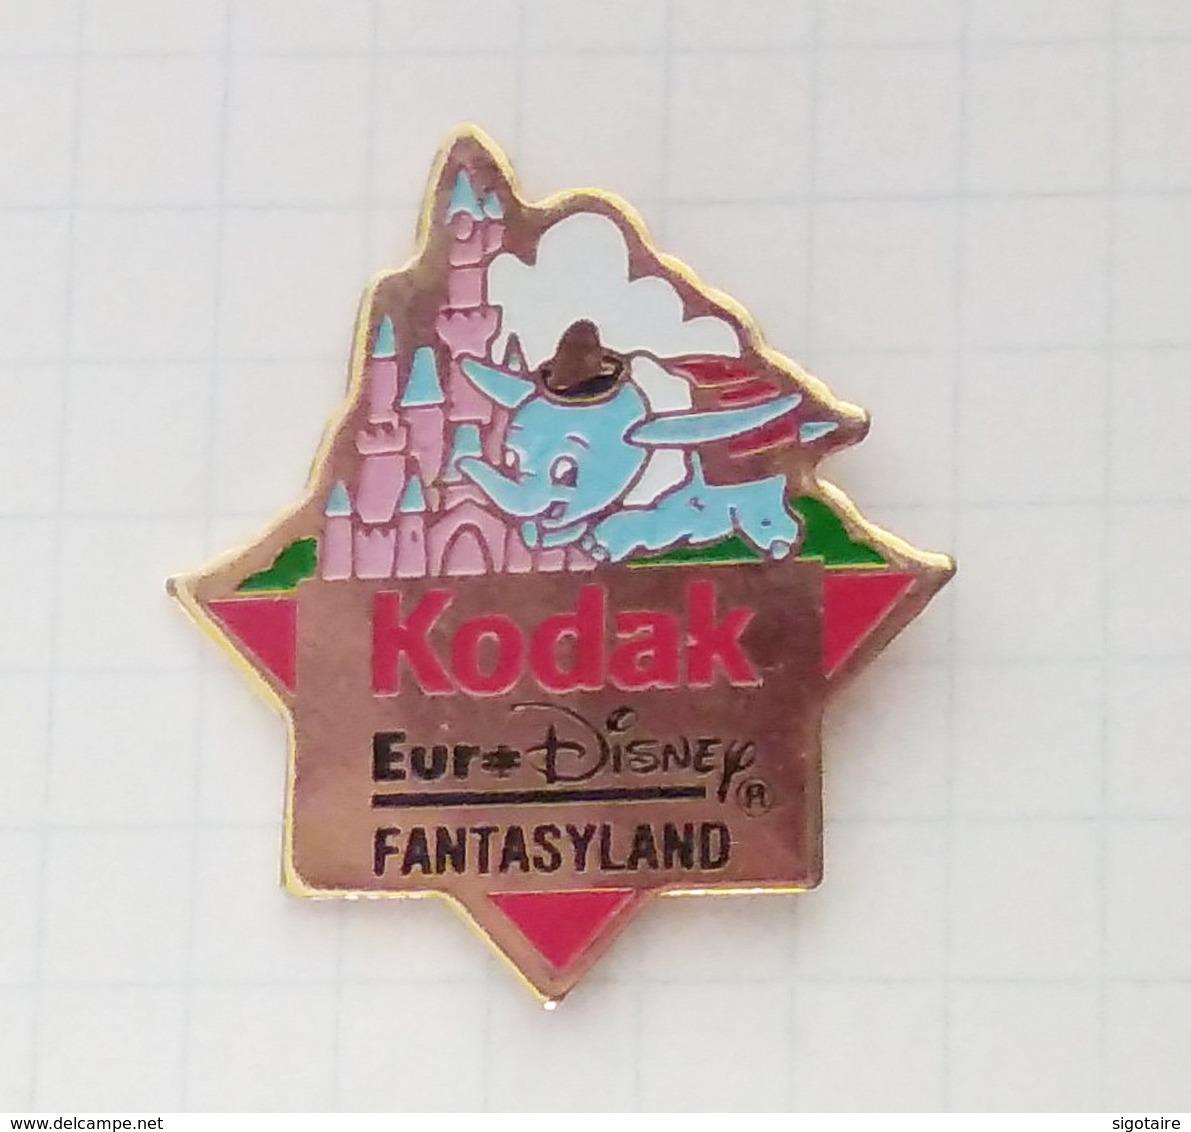 Kodak - EuroDisney - Fantasyland - Disney